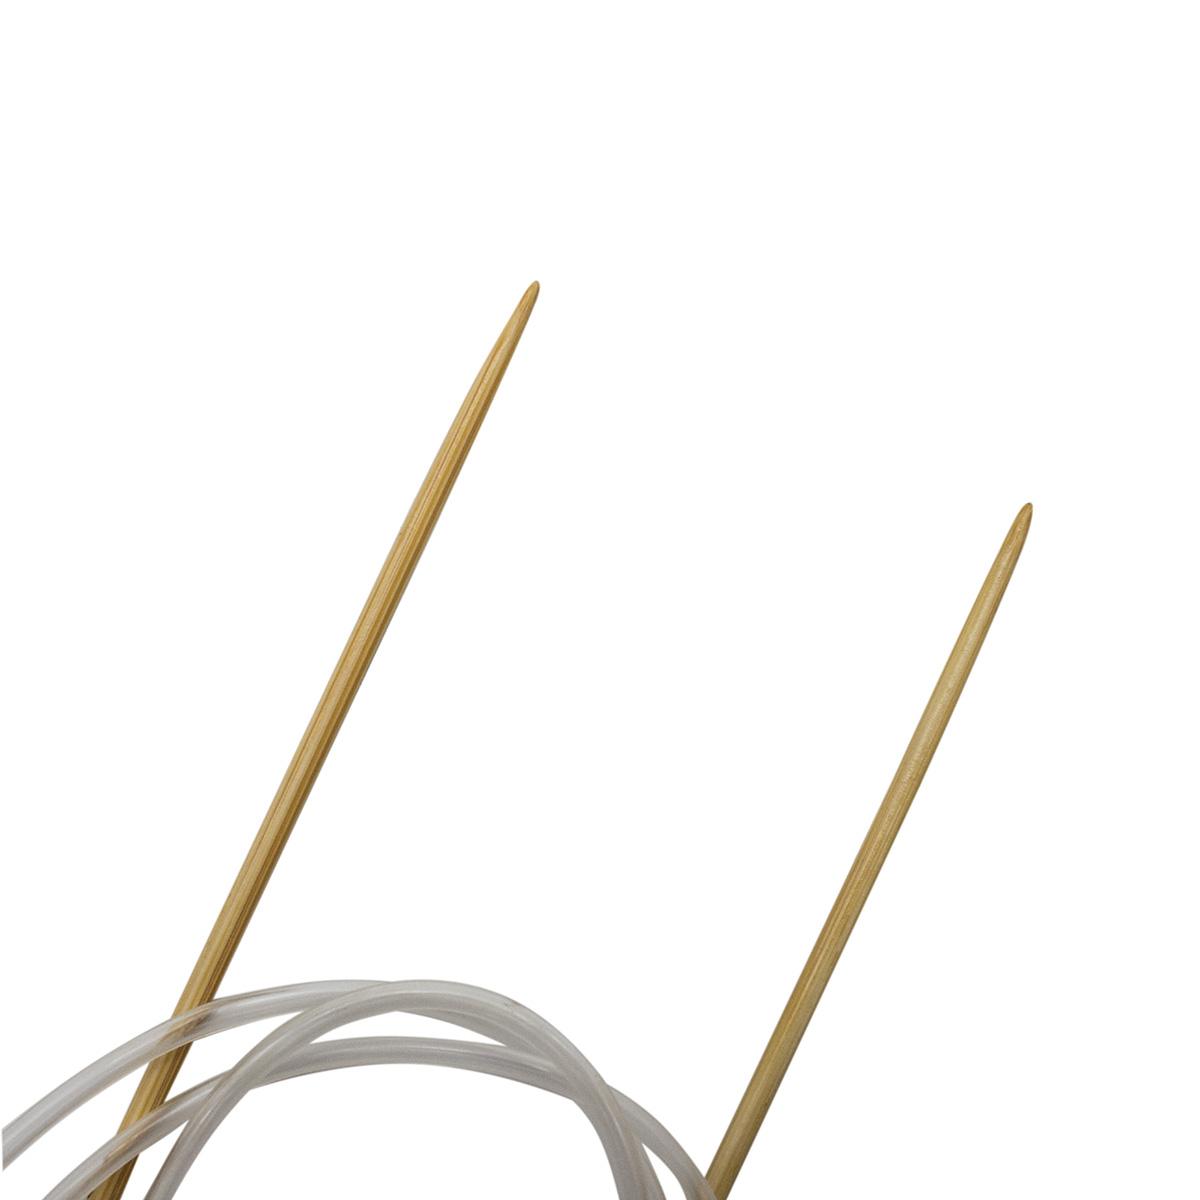 Спицы круговые бамбук 942130, 100 см, 3,0 мм, Hobby&Pro